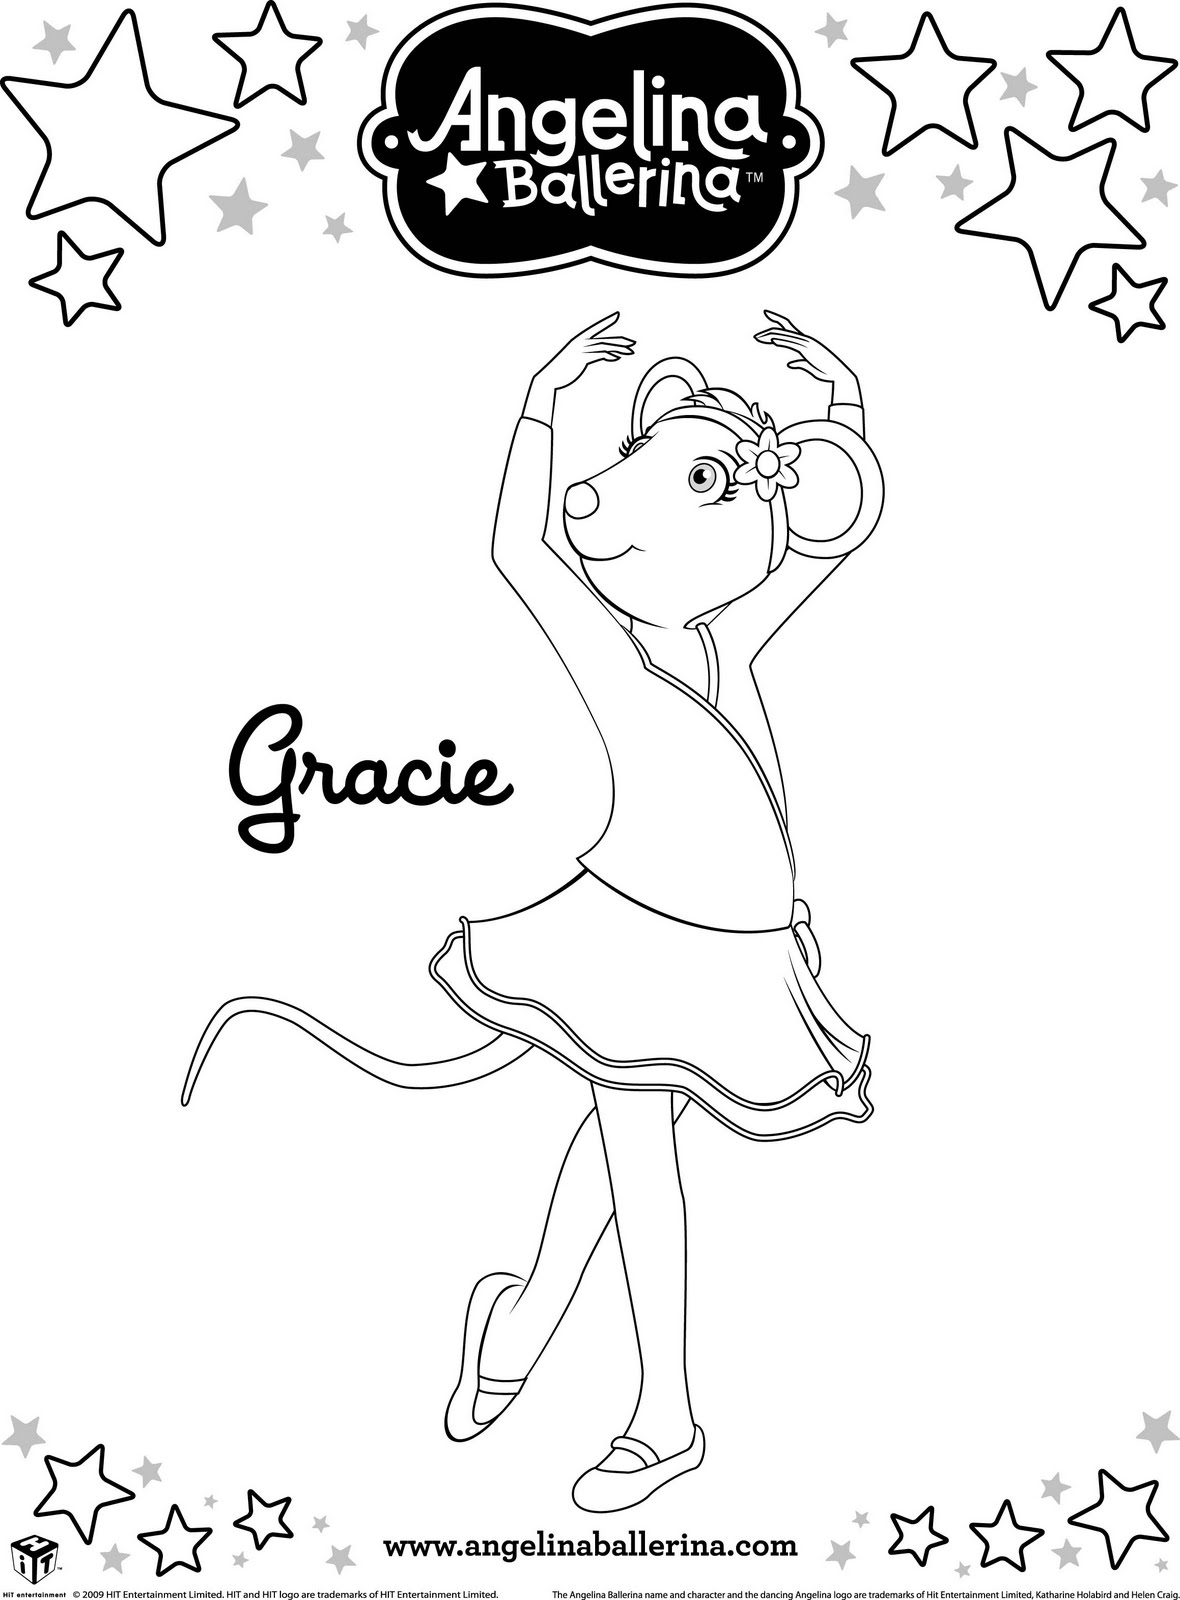 Angelina Ballerina - Desenhos para Colorir | Desenhos e Riscos ...